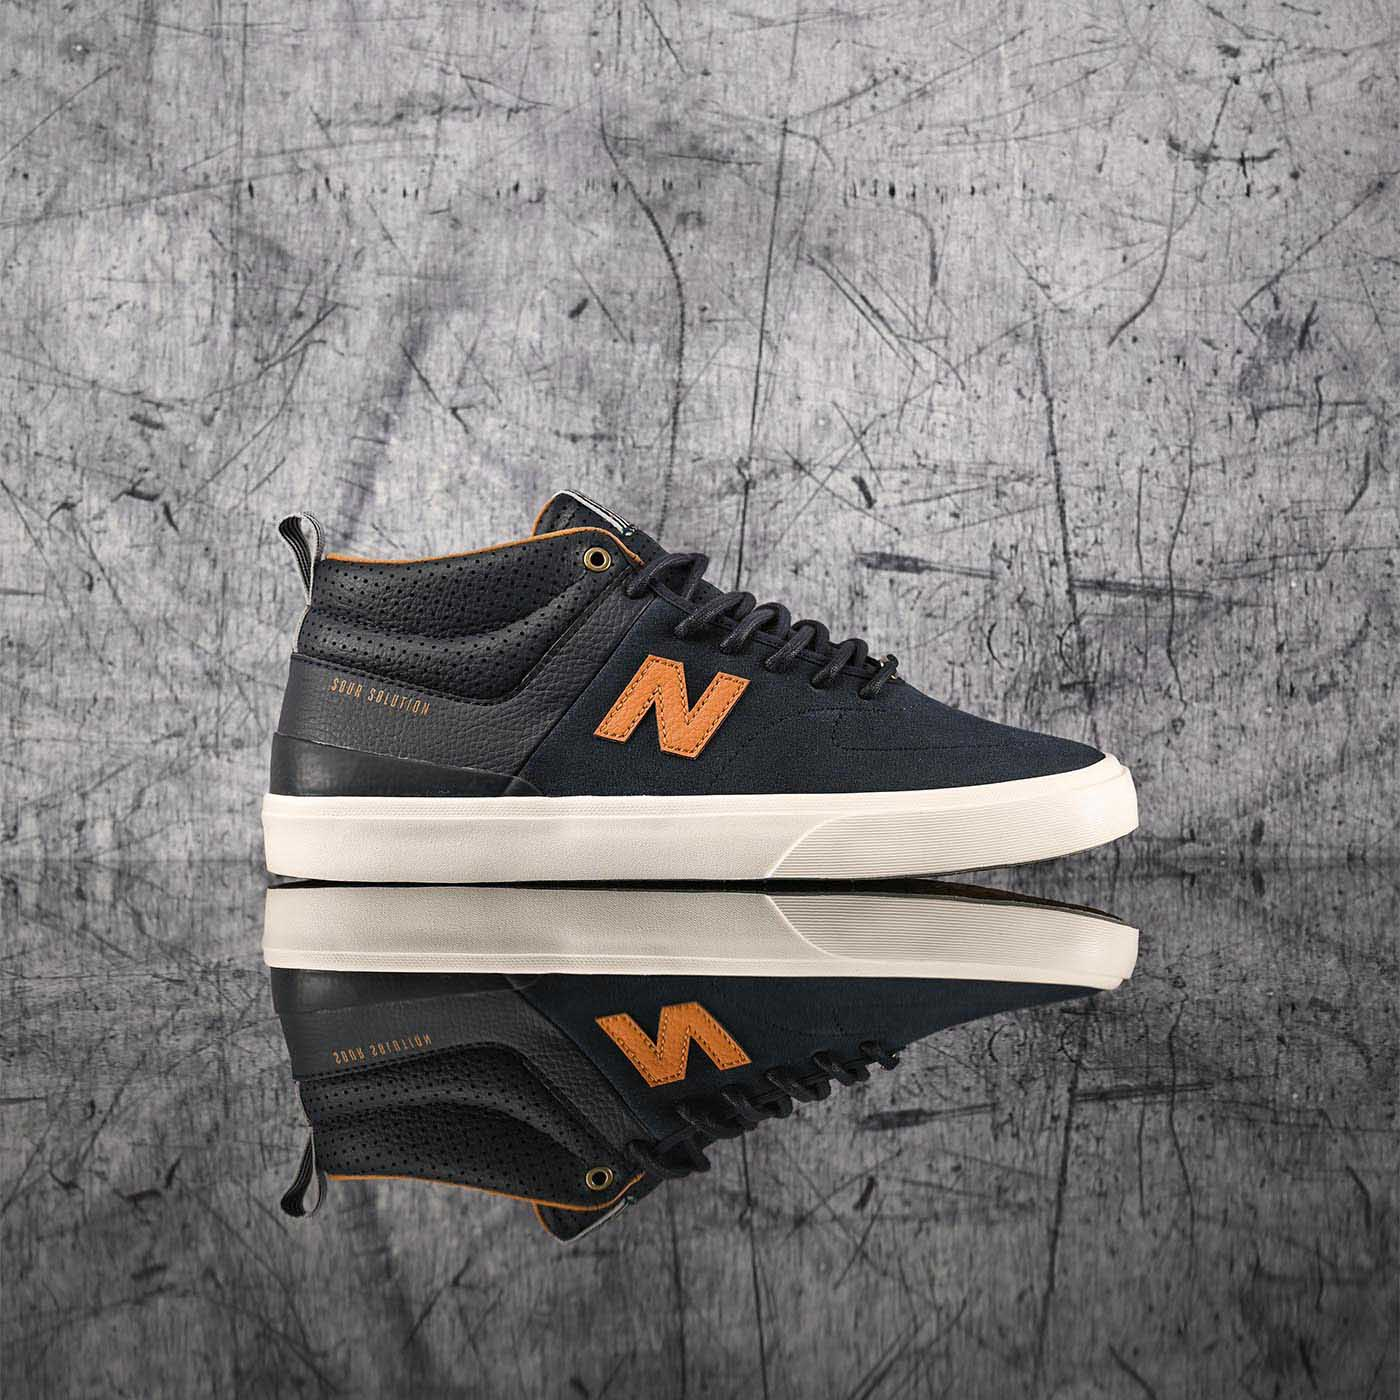 New Balance x Sour Skateboards